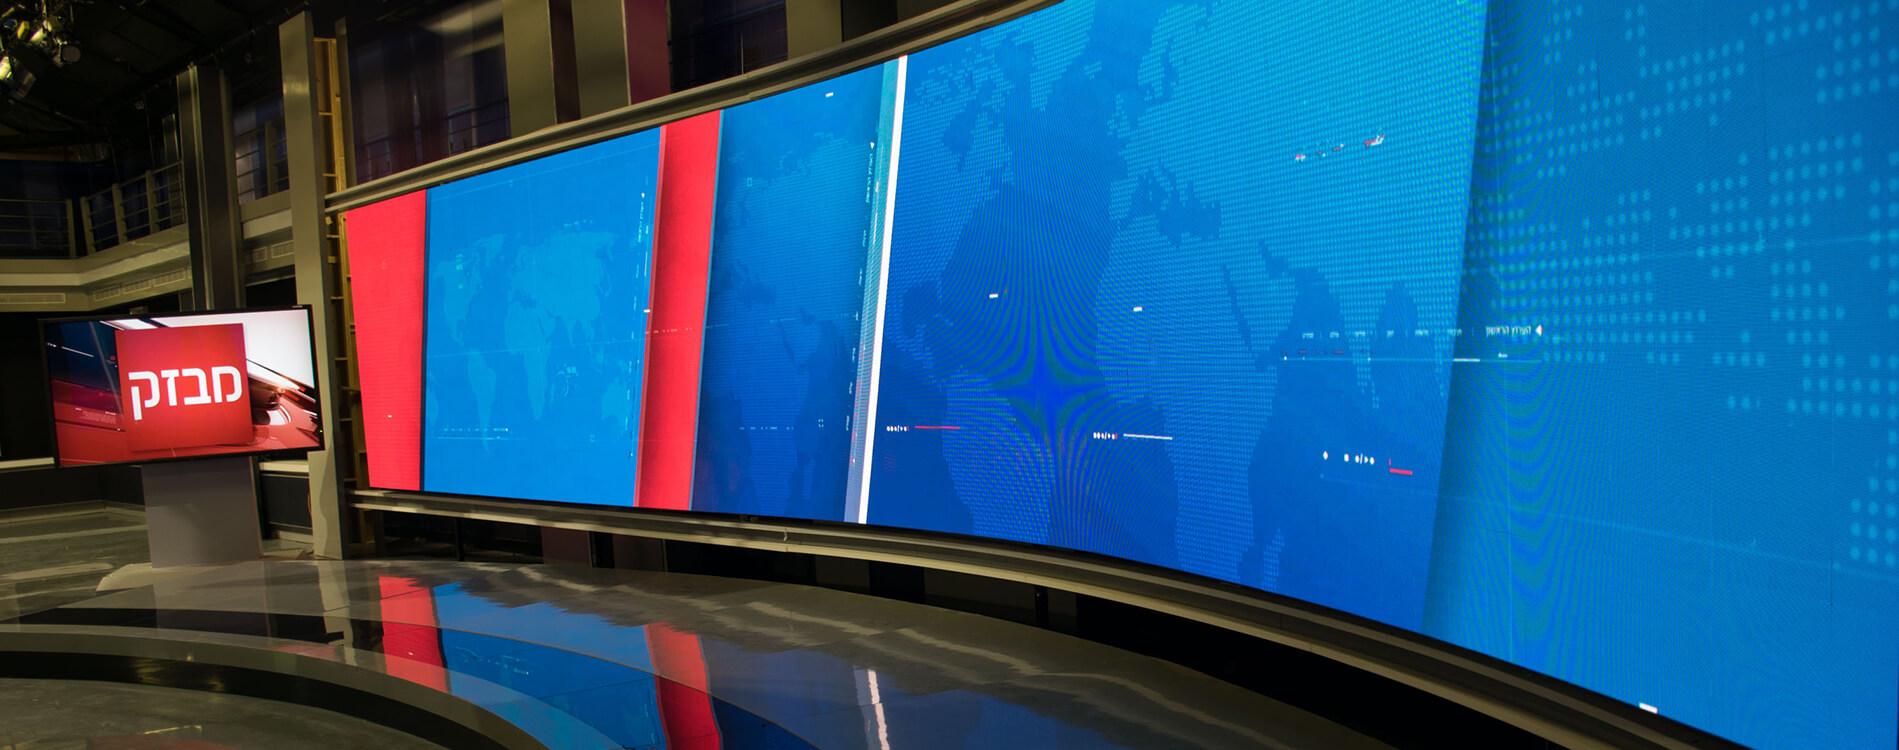 Samsung Video Wall Display